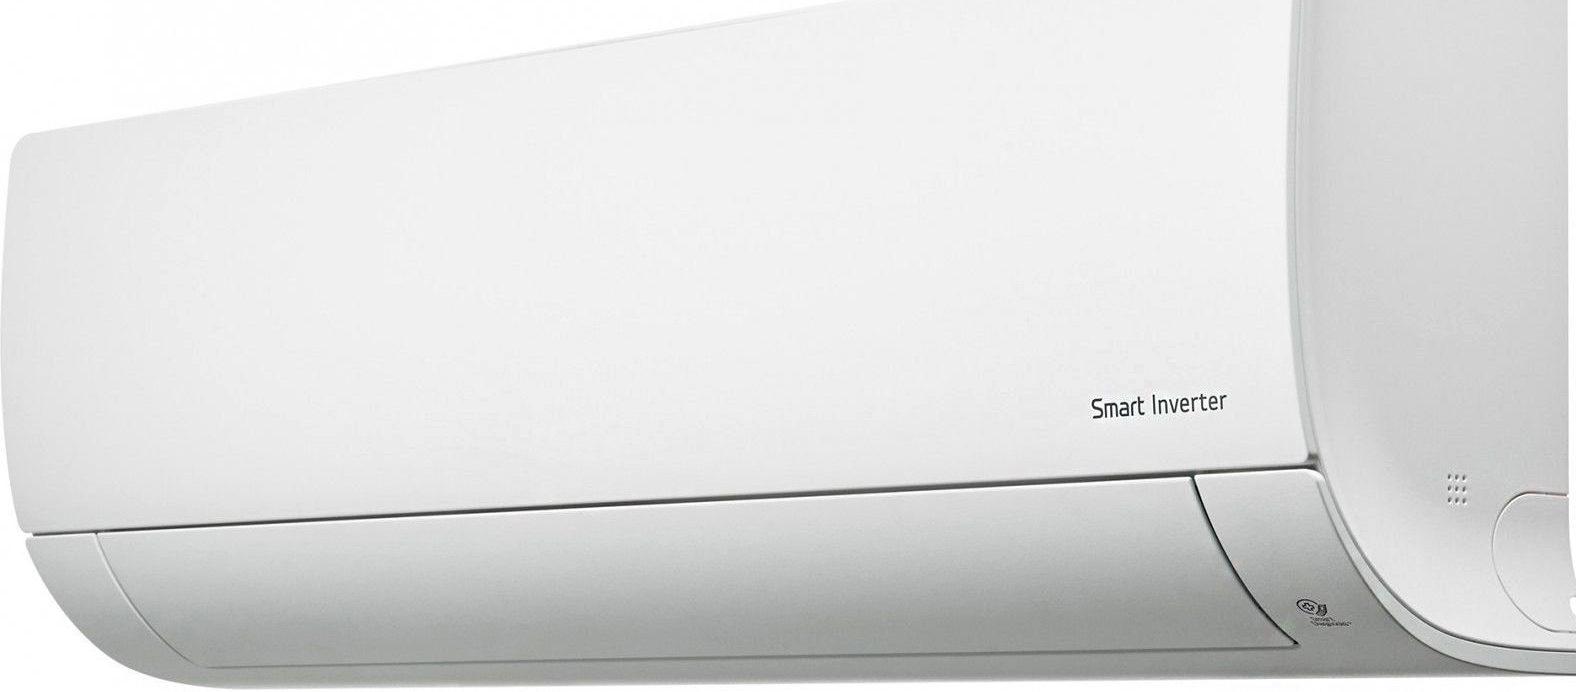 repair of air conditioners